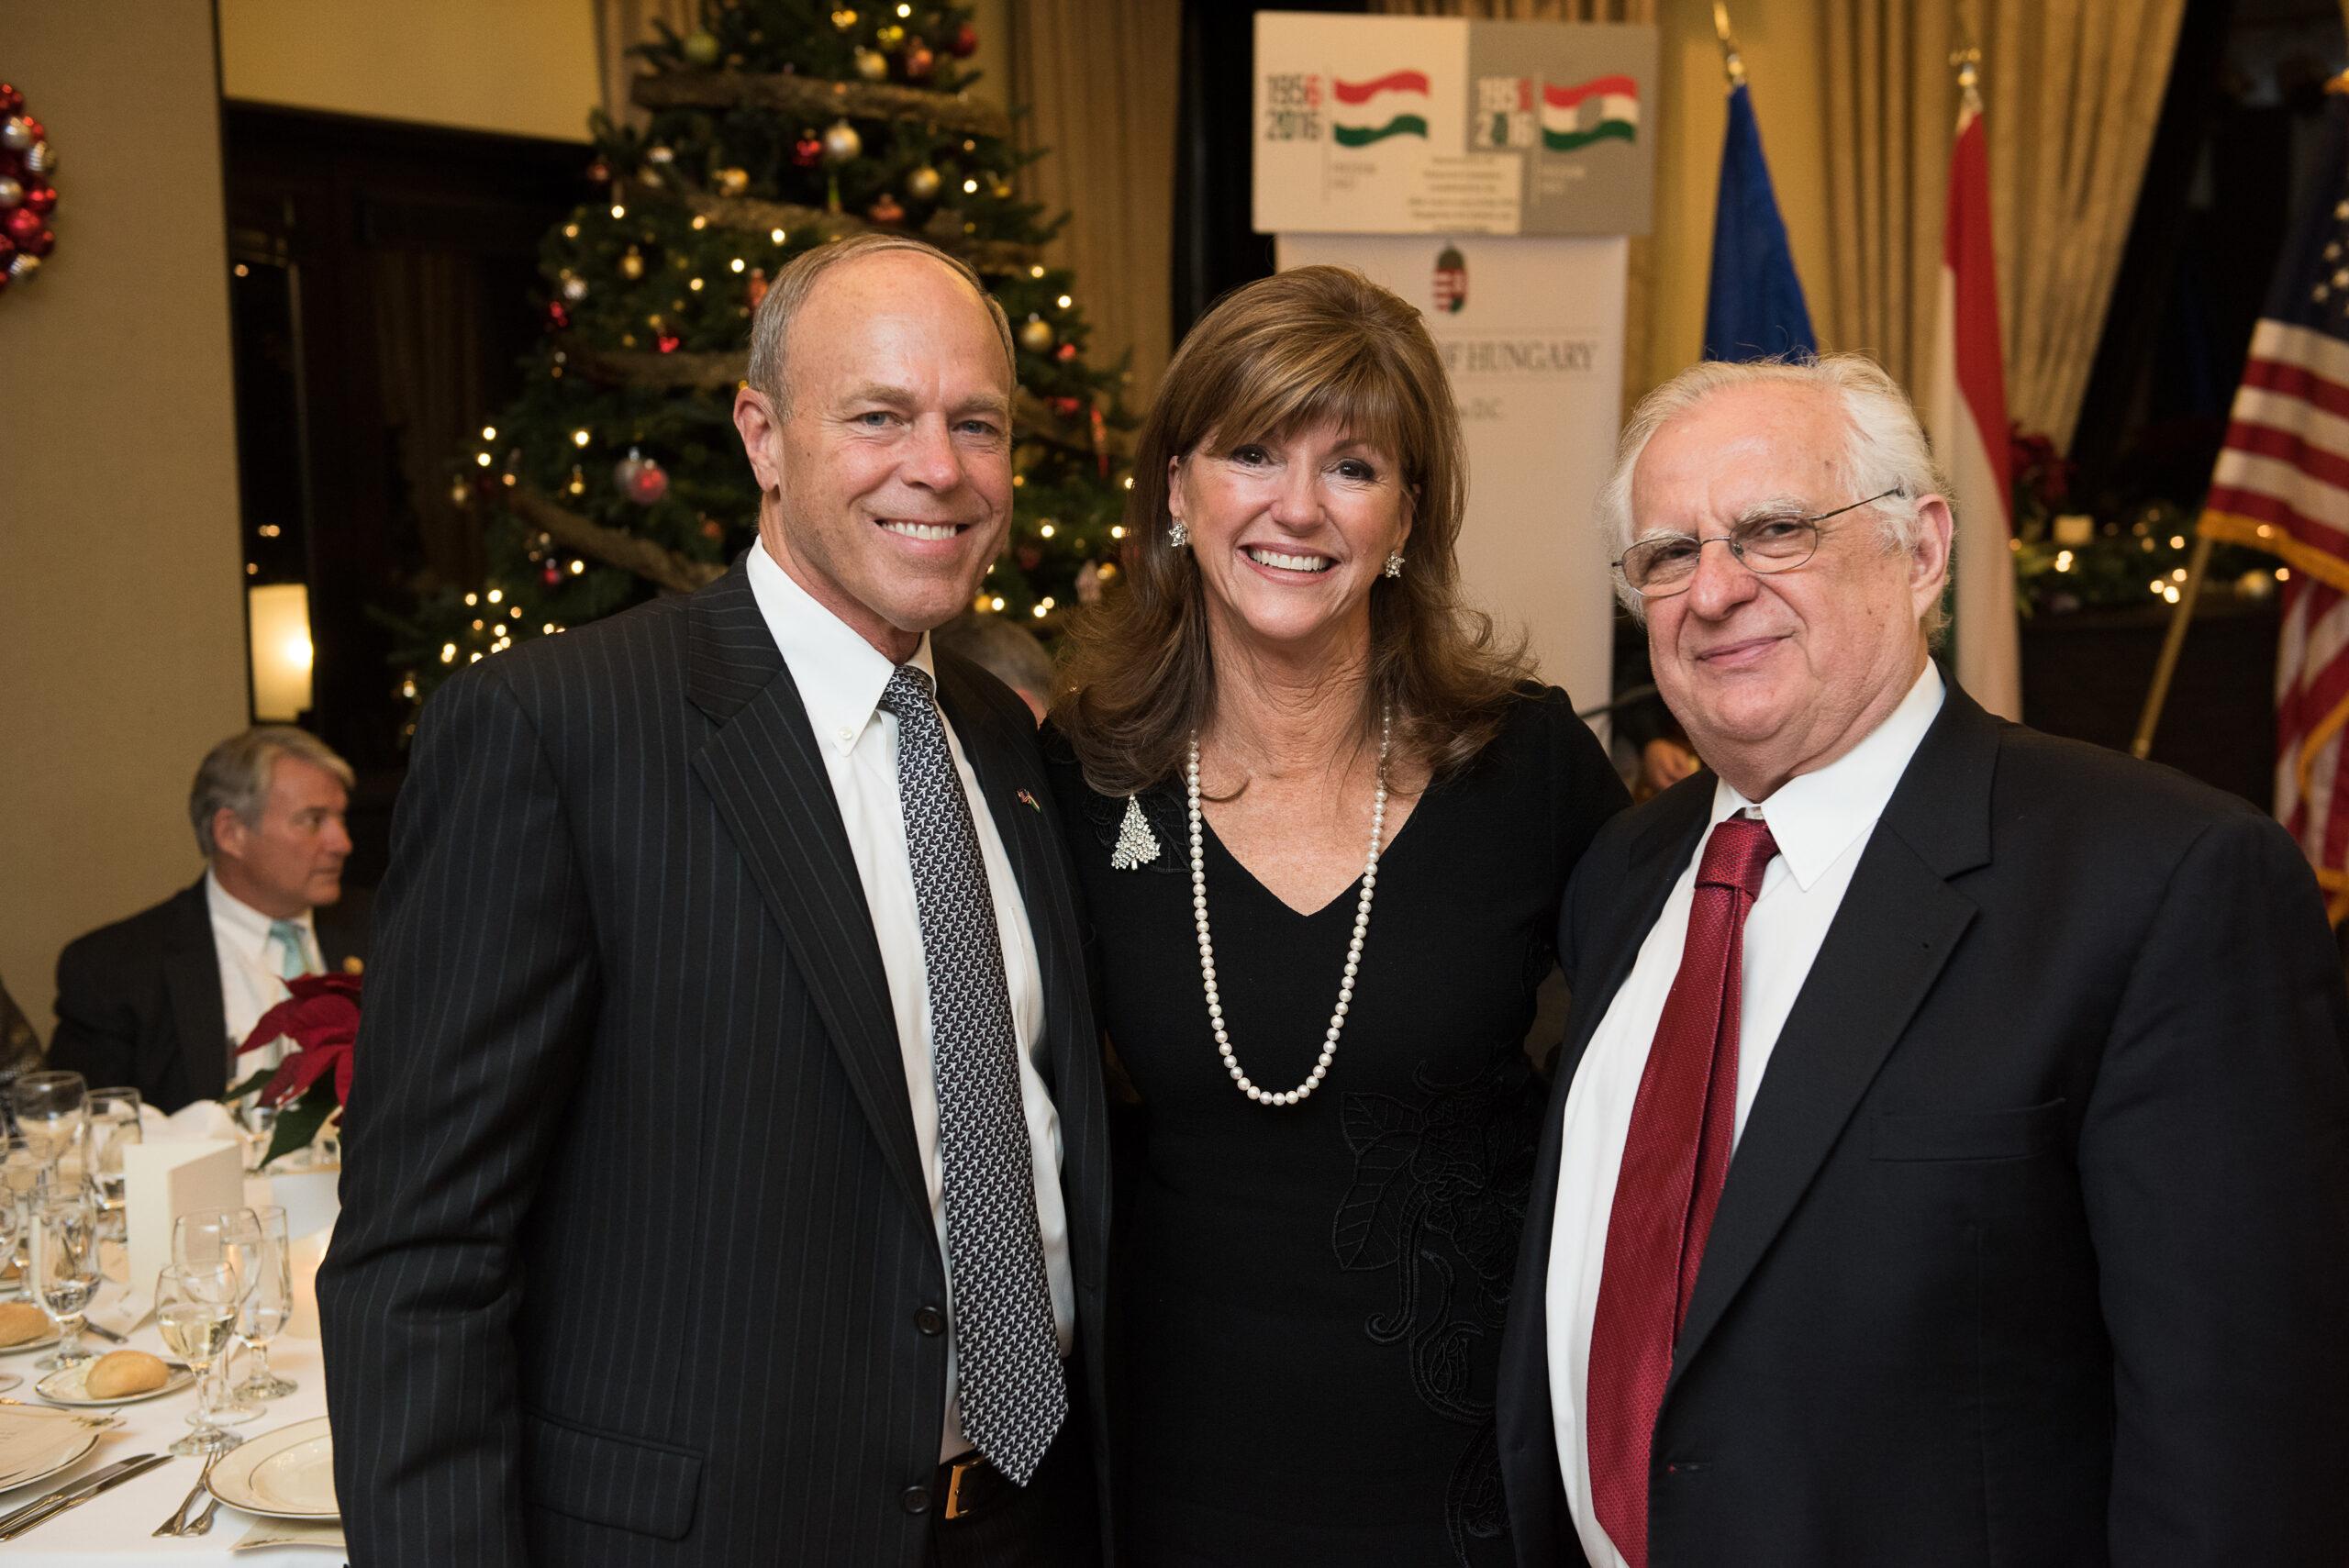 Mr. Andy Hutchison, Mrs. Susan Hutchison (Chairman of the Washington State Republican Party), Coalition Treasurer Zsolt Szekeres